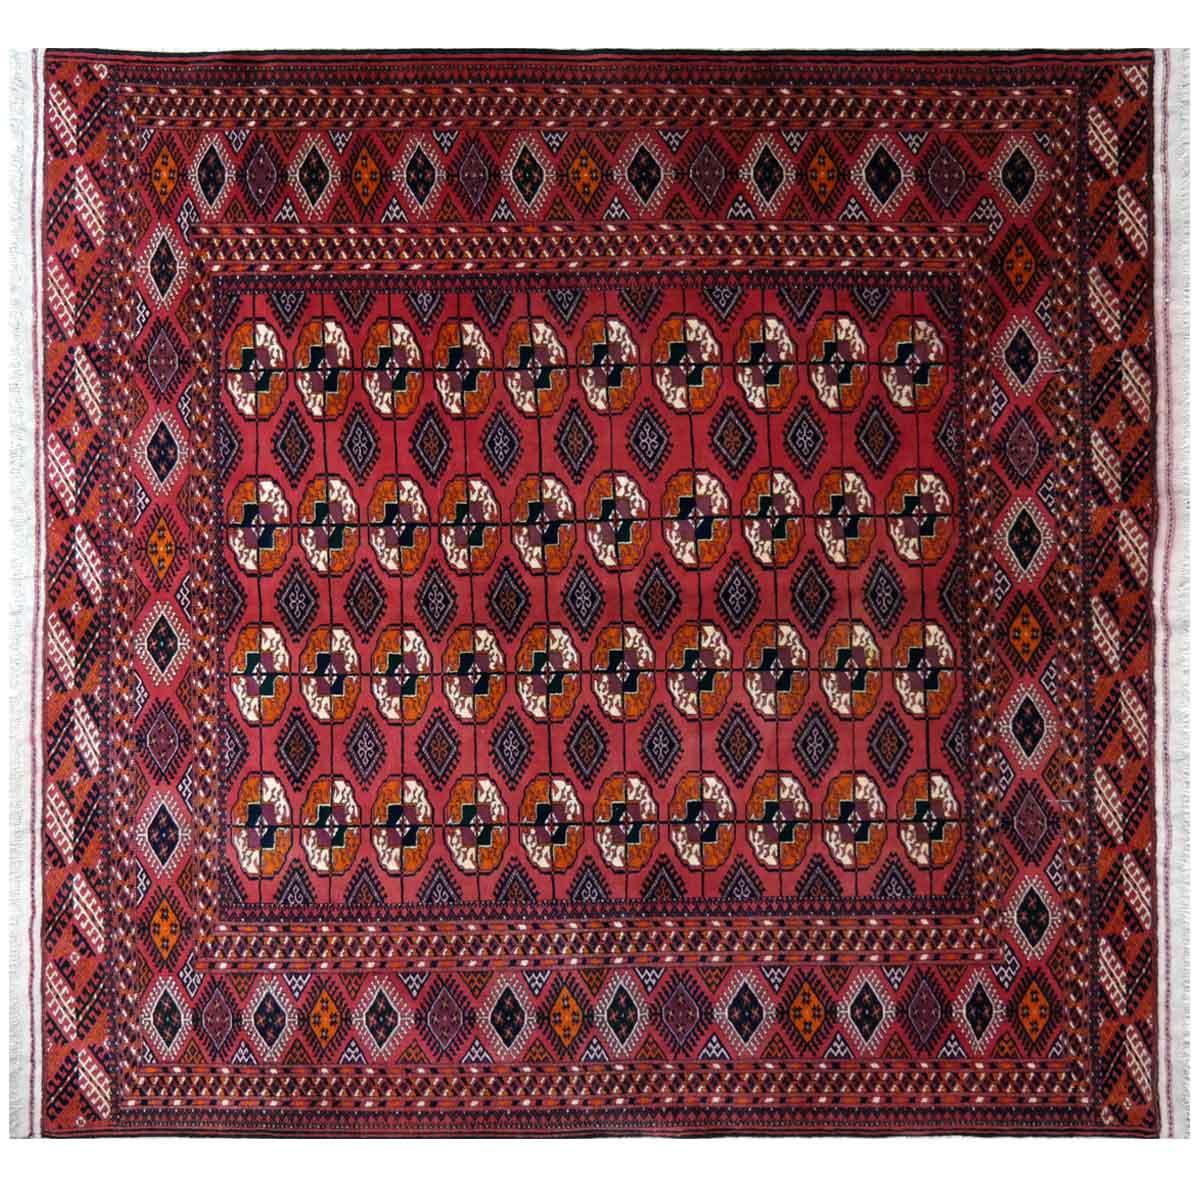 Bukara-Turkmeno-5988-200×1954200-2250